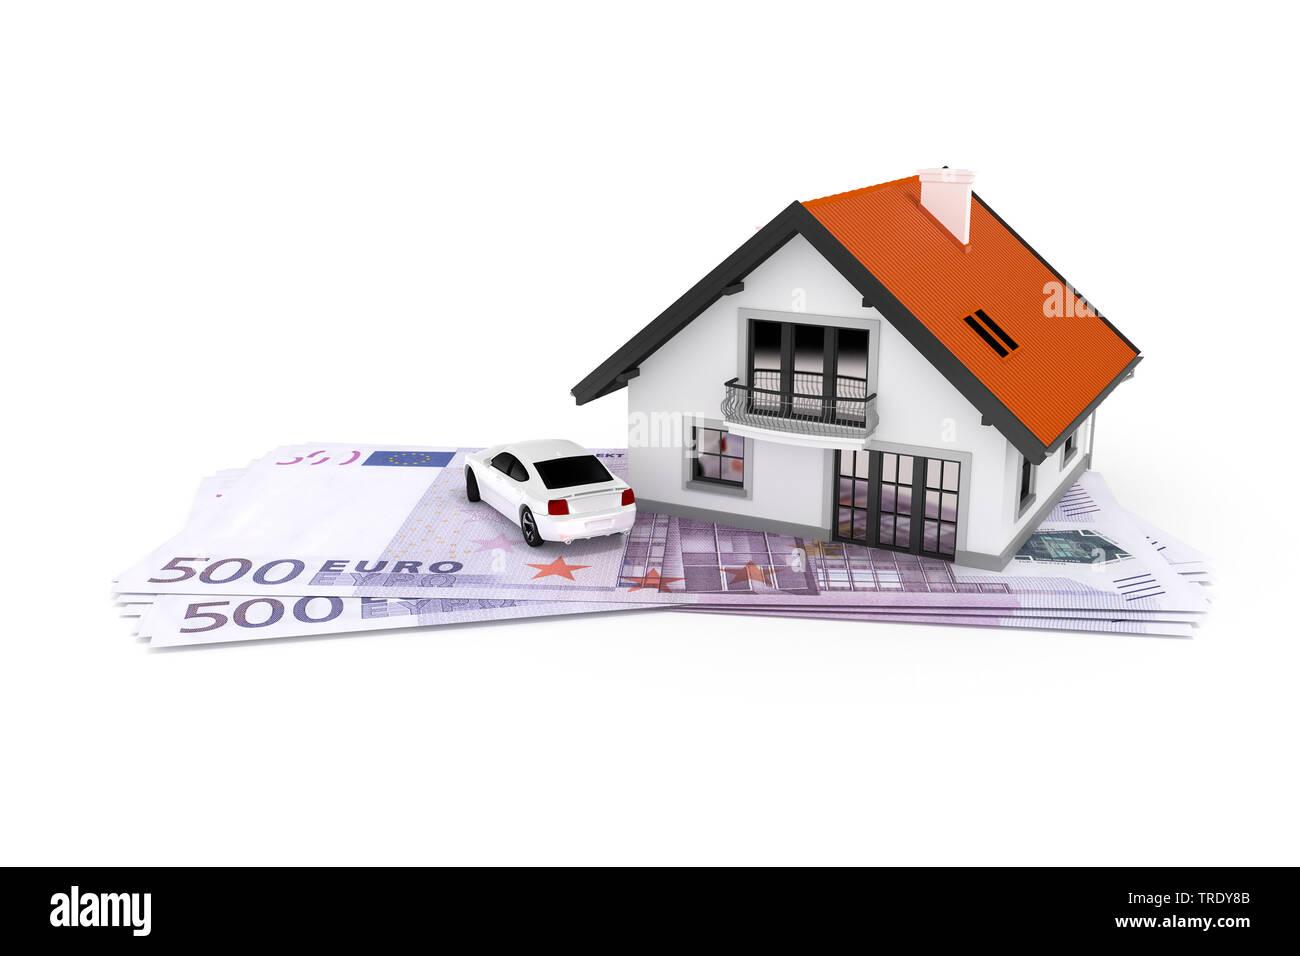 3D-Computergrafik, Symbolbild eines Wohnhauses auf Banknoten stehend | 3D computer graphic, residental house standing on top of banknotes | BLWS512395 - Stock Image